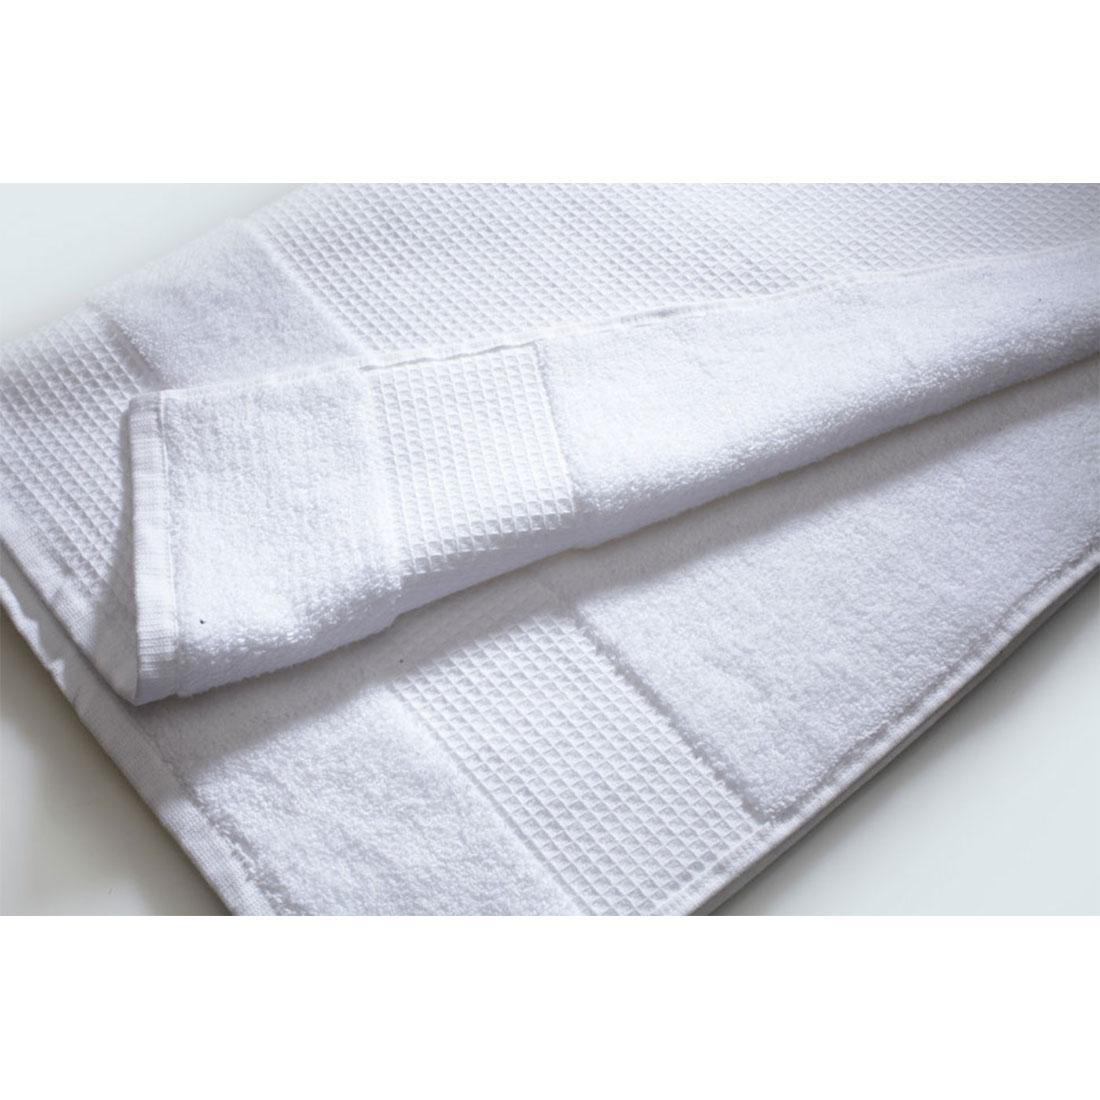 Fisher West NY White Cotton Waffle Terry Bath Towel  FWNYBathtowel